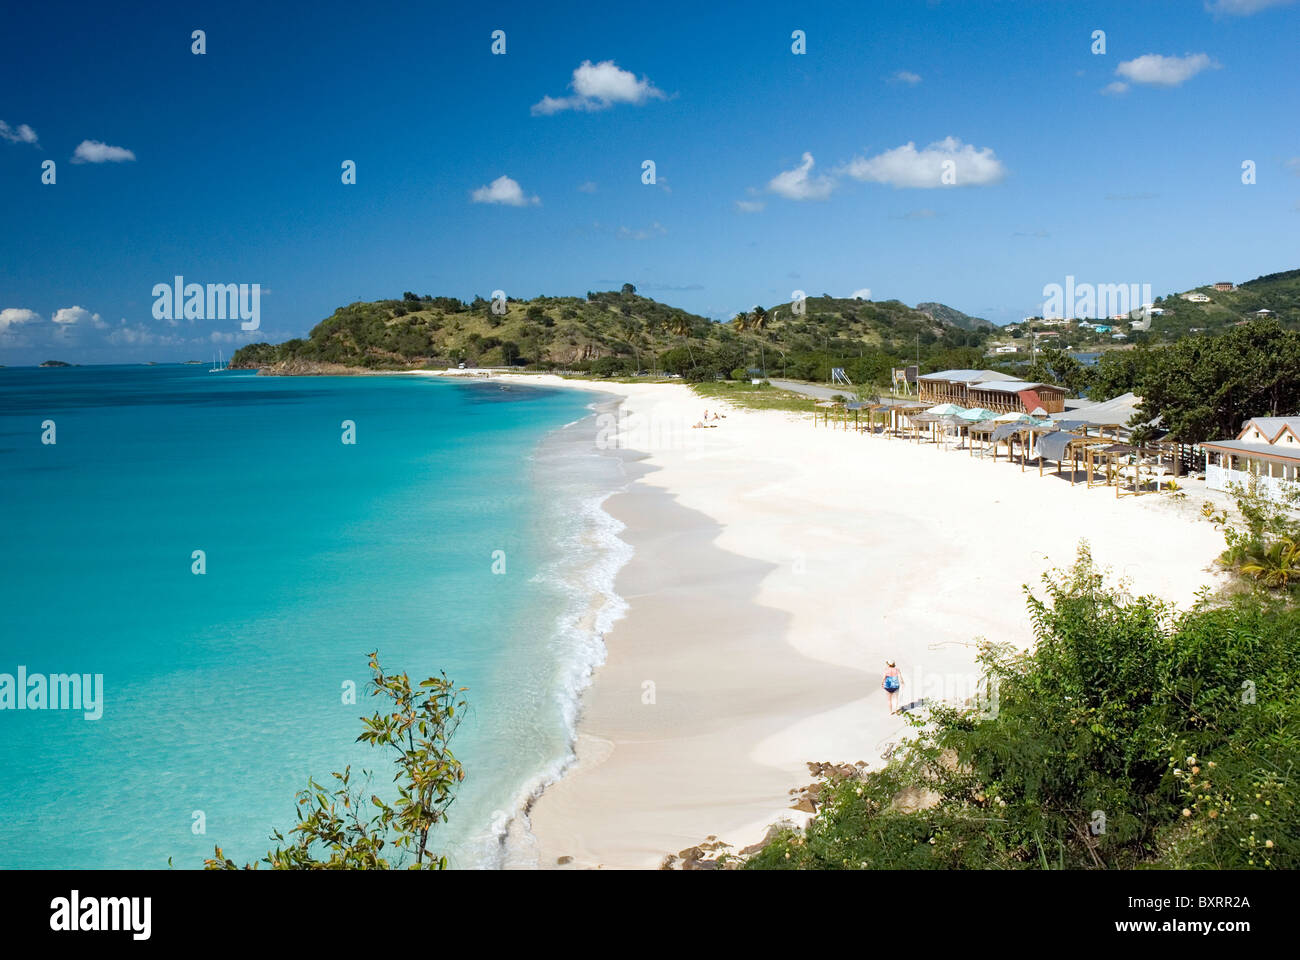 Caribbean, Leeward Islands, Antigua, view of Darkwood beach Stock Photo